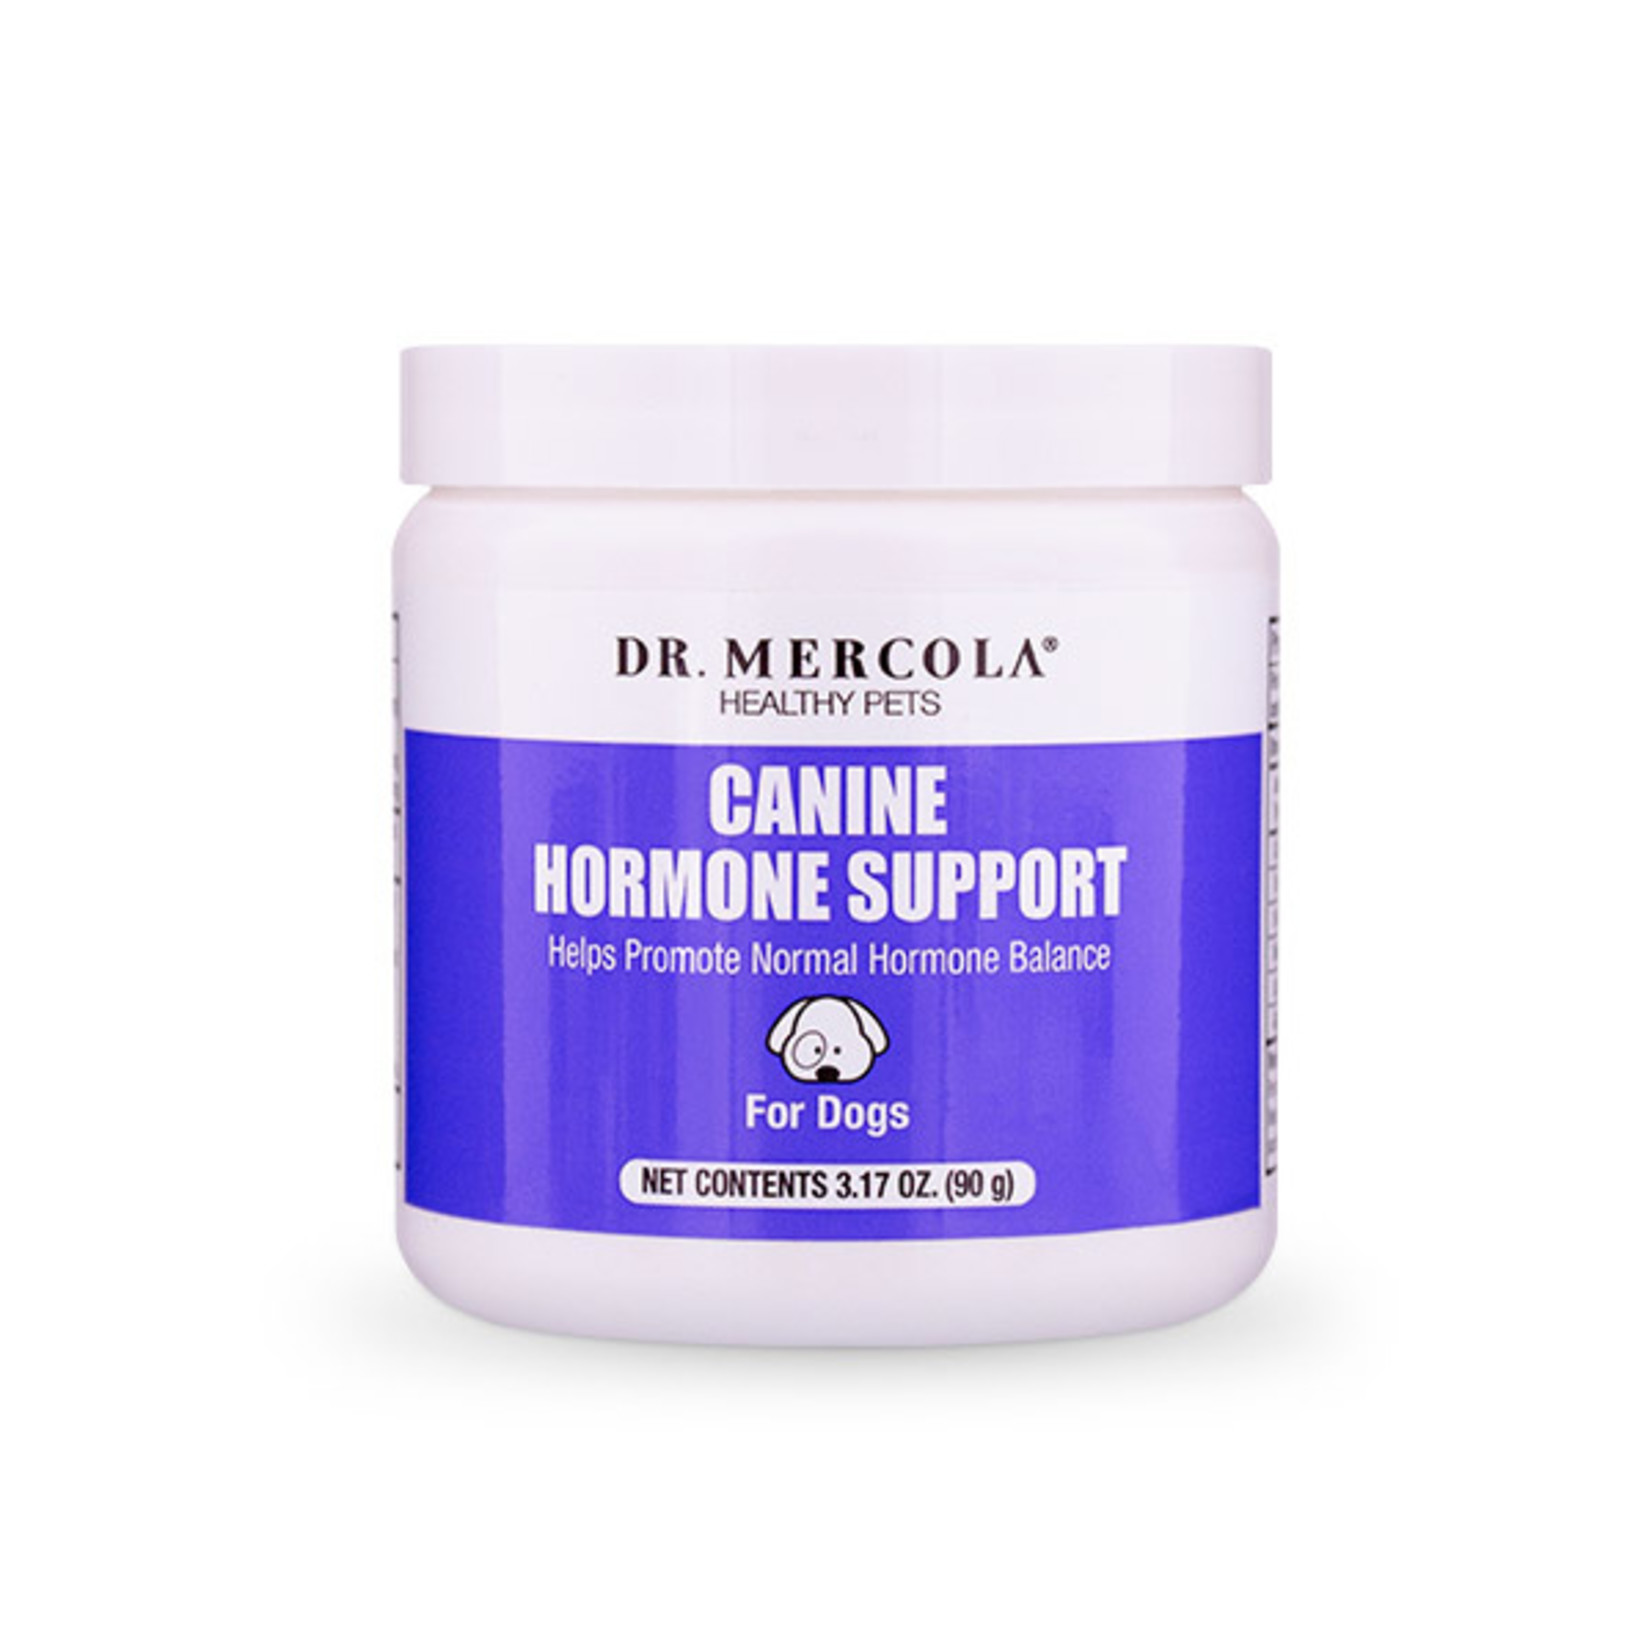 Mercola Dr. Mercola Canine Hormone Support 3.17oz